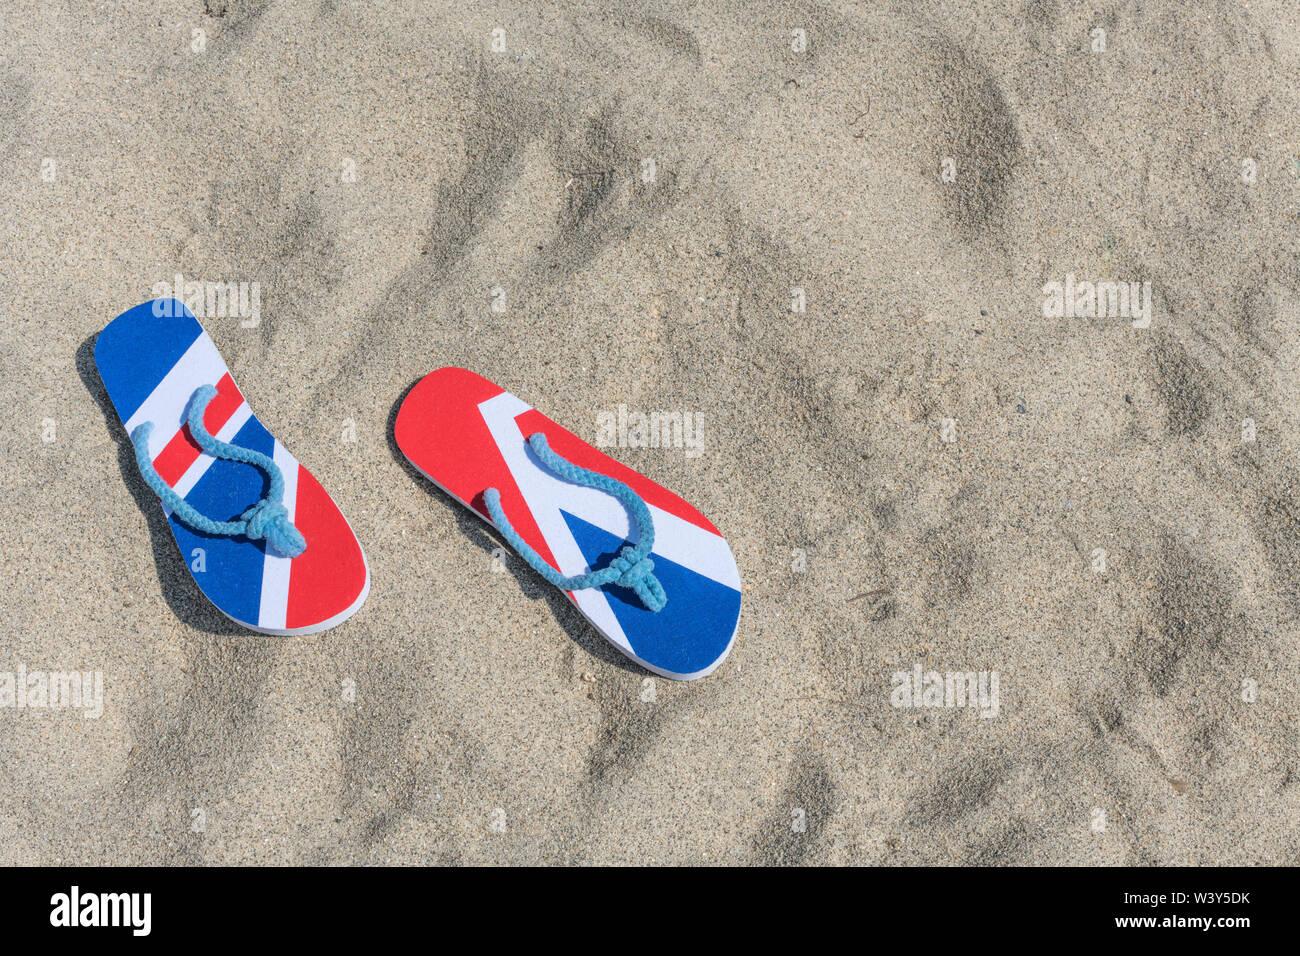 GB flag / Union Jack flip flops on sandy beach - metaphor UK staycation, holidays at home, staycation Cornwall, seaside holiday, flip-flop footwear. - Stock Image